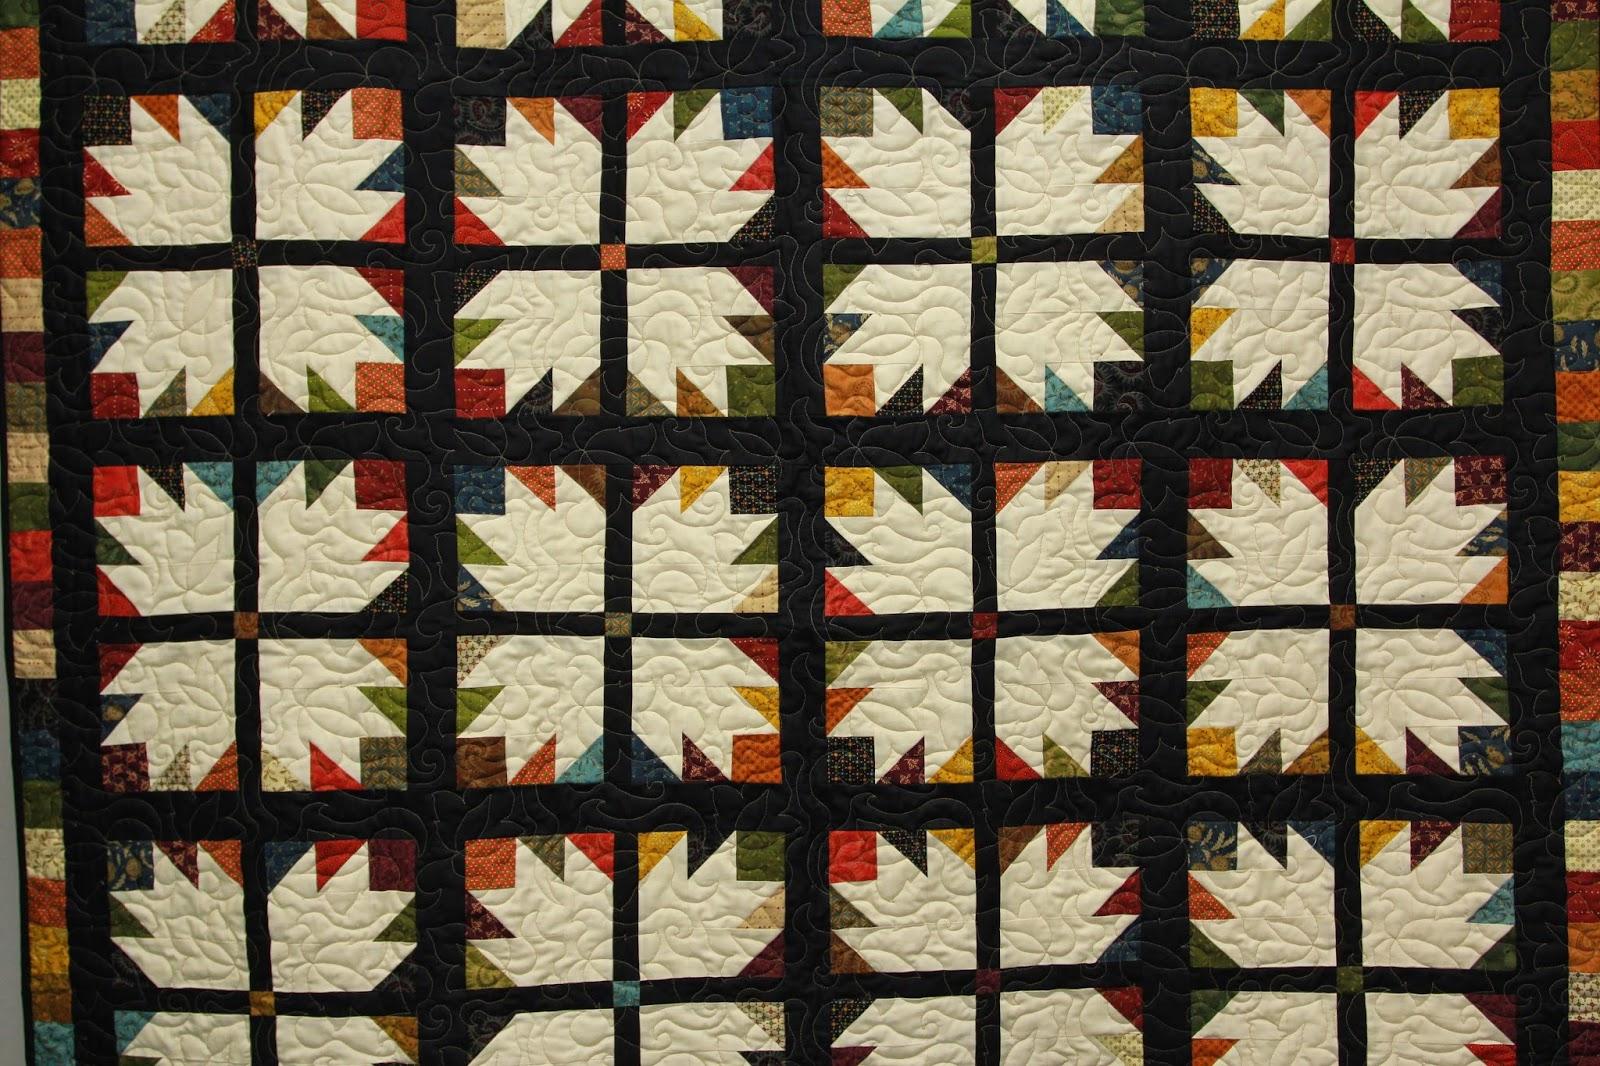 Henry glass fabrics heritage hollow tutorial heritage hollow tutorial baditri Images